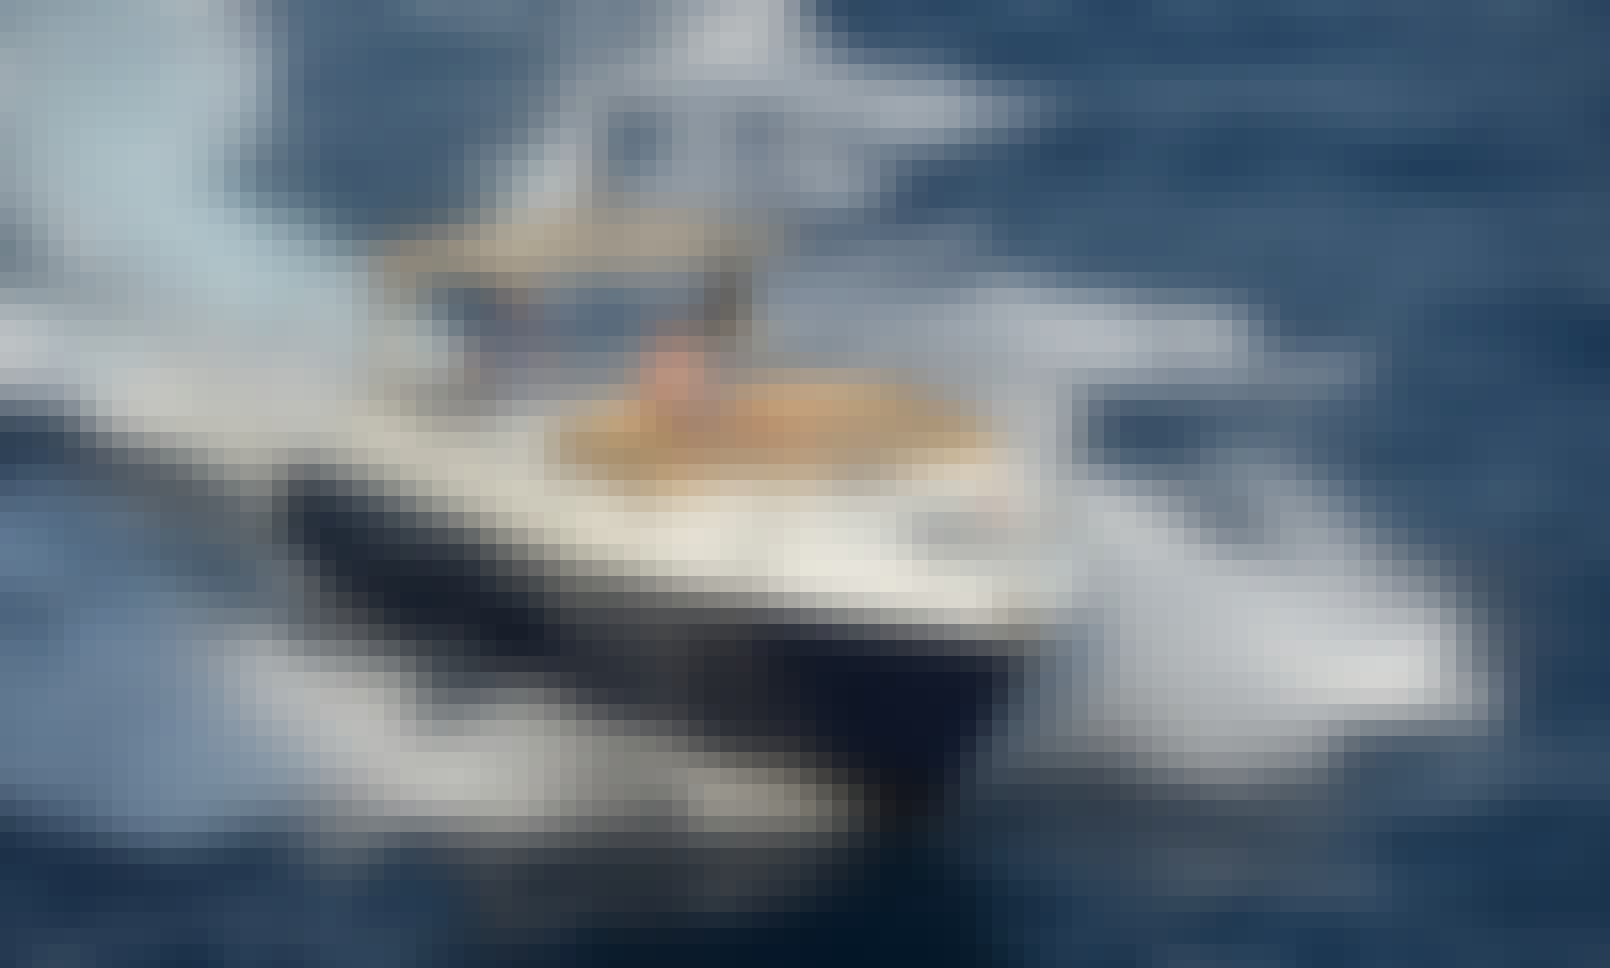 Motor Yacht Charter - 10 People Capacity